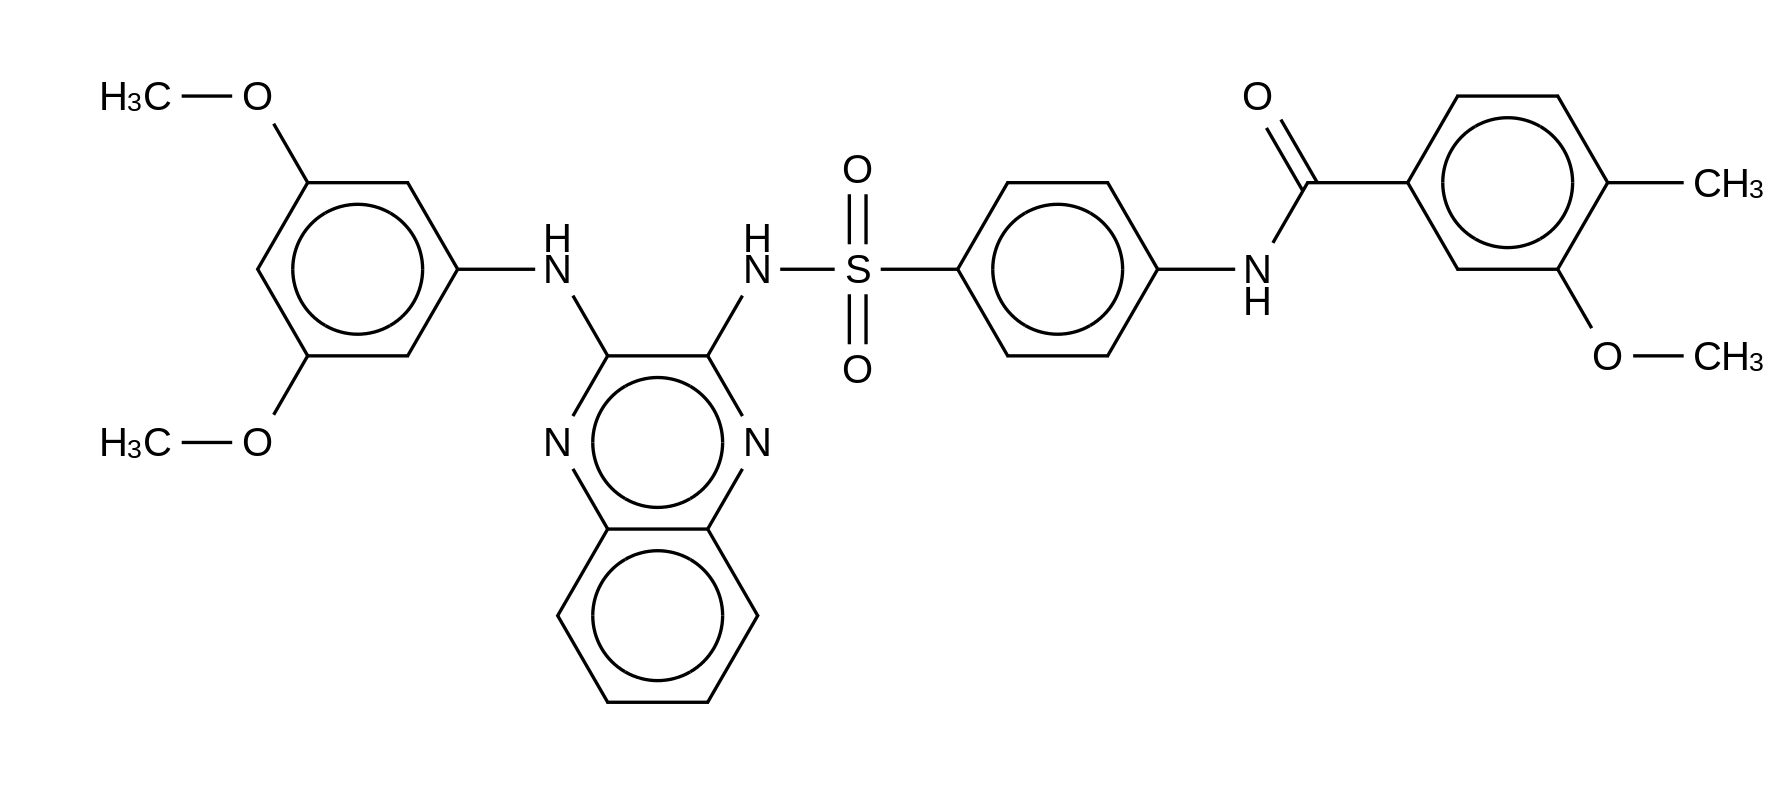 XL765